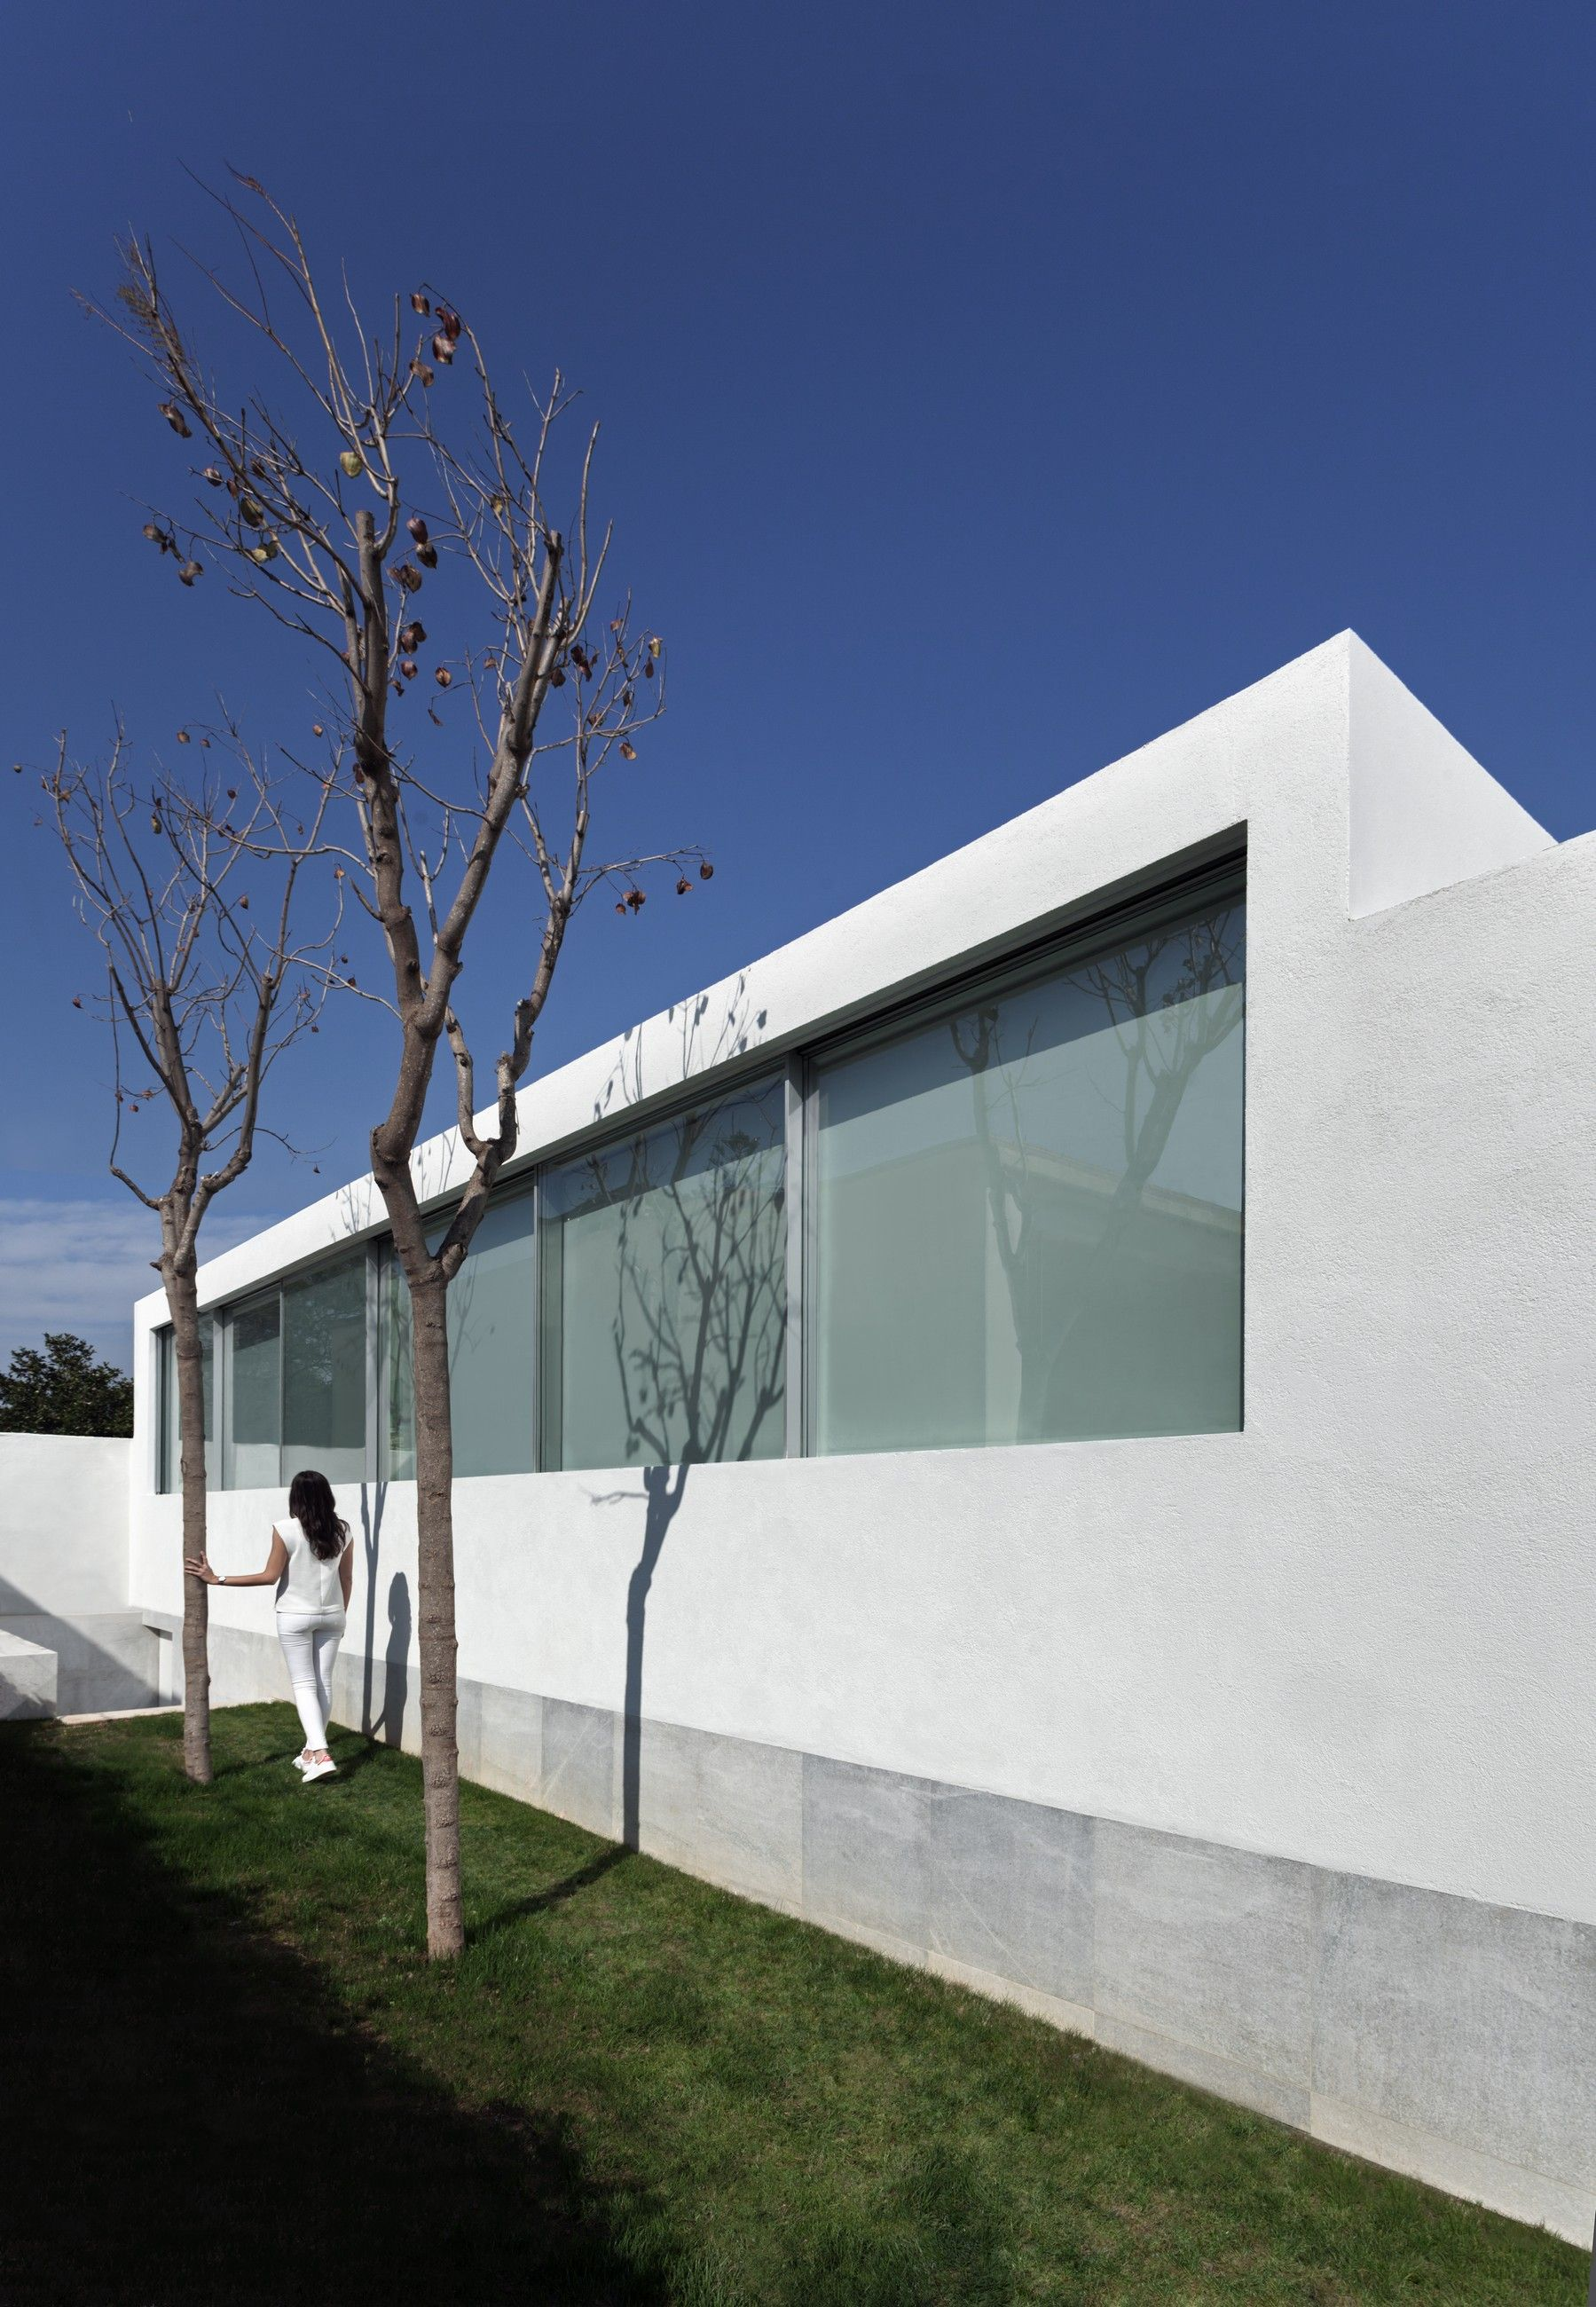 Breeze house fran silvestre architects media photos and videos 5 archello